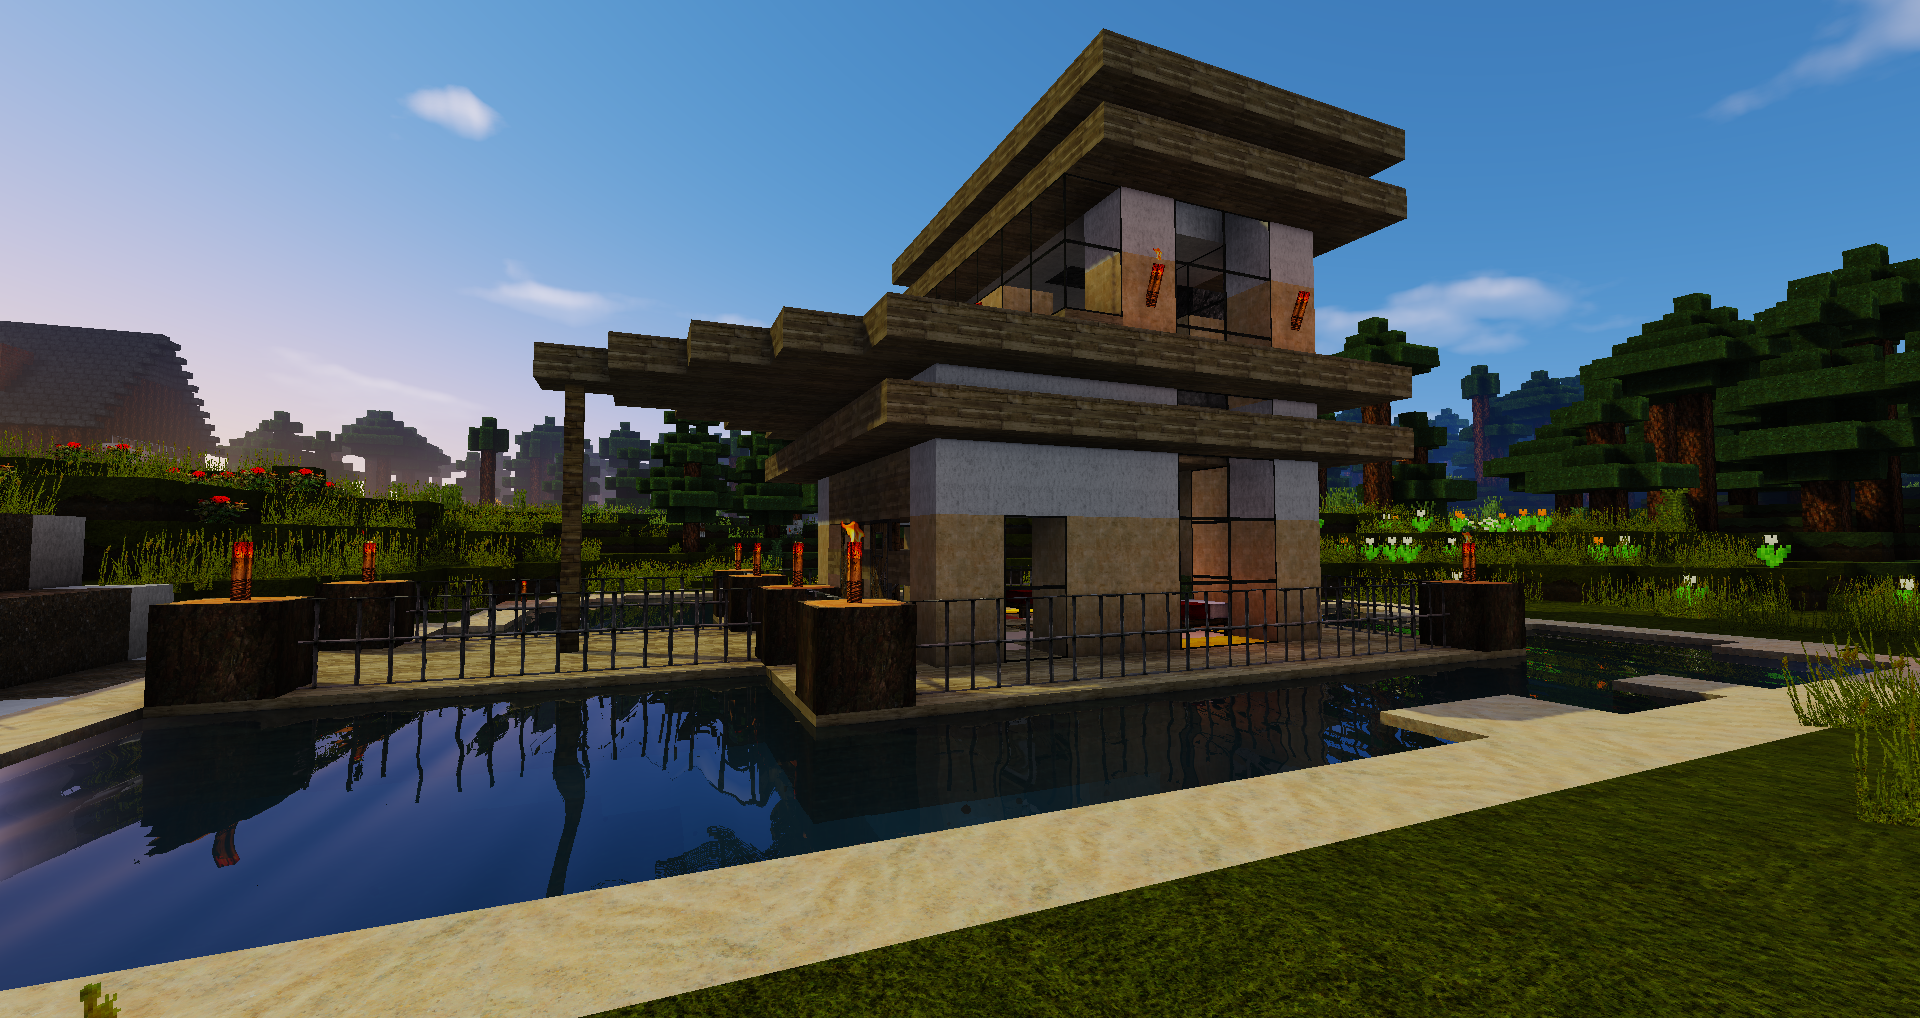 Minecraft Boat House w/shaders My own creation  Minecraft designs